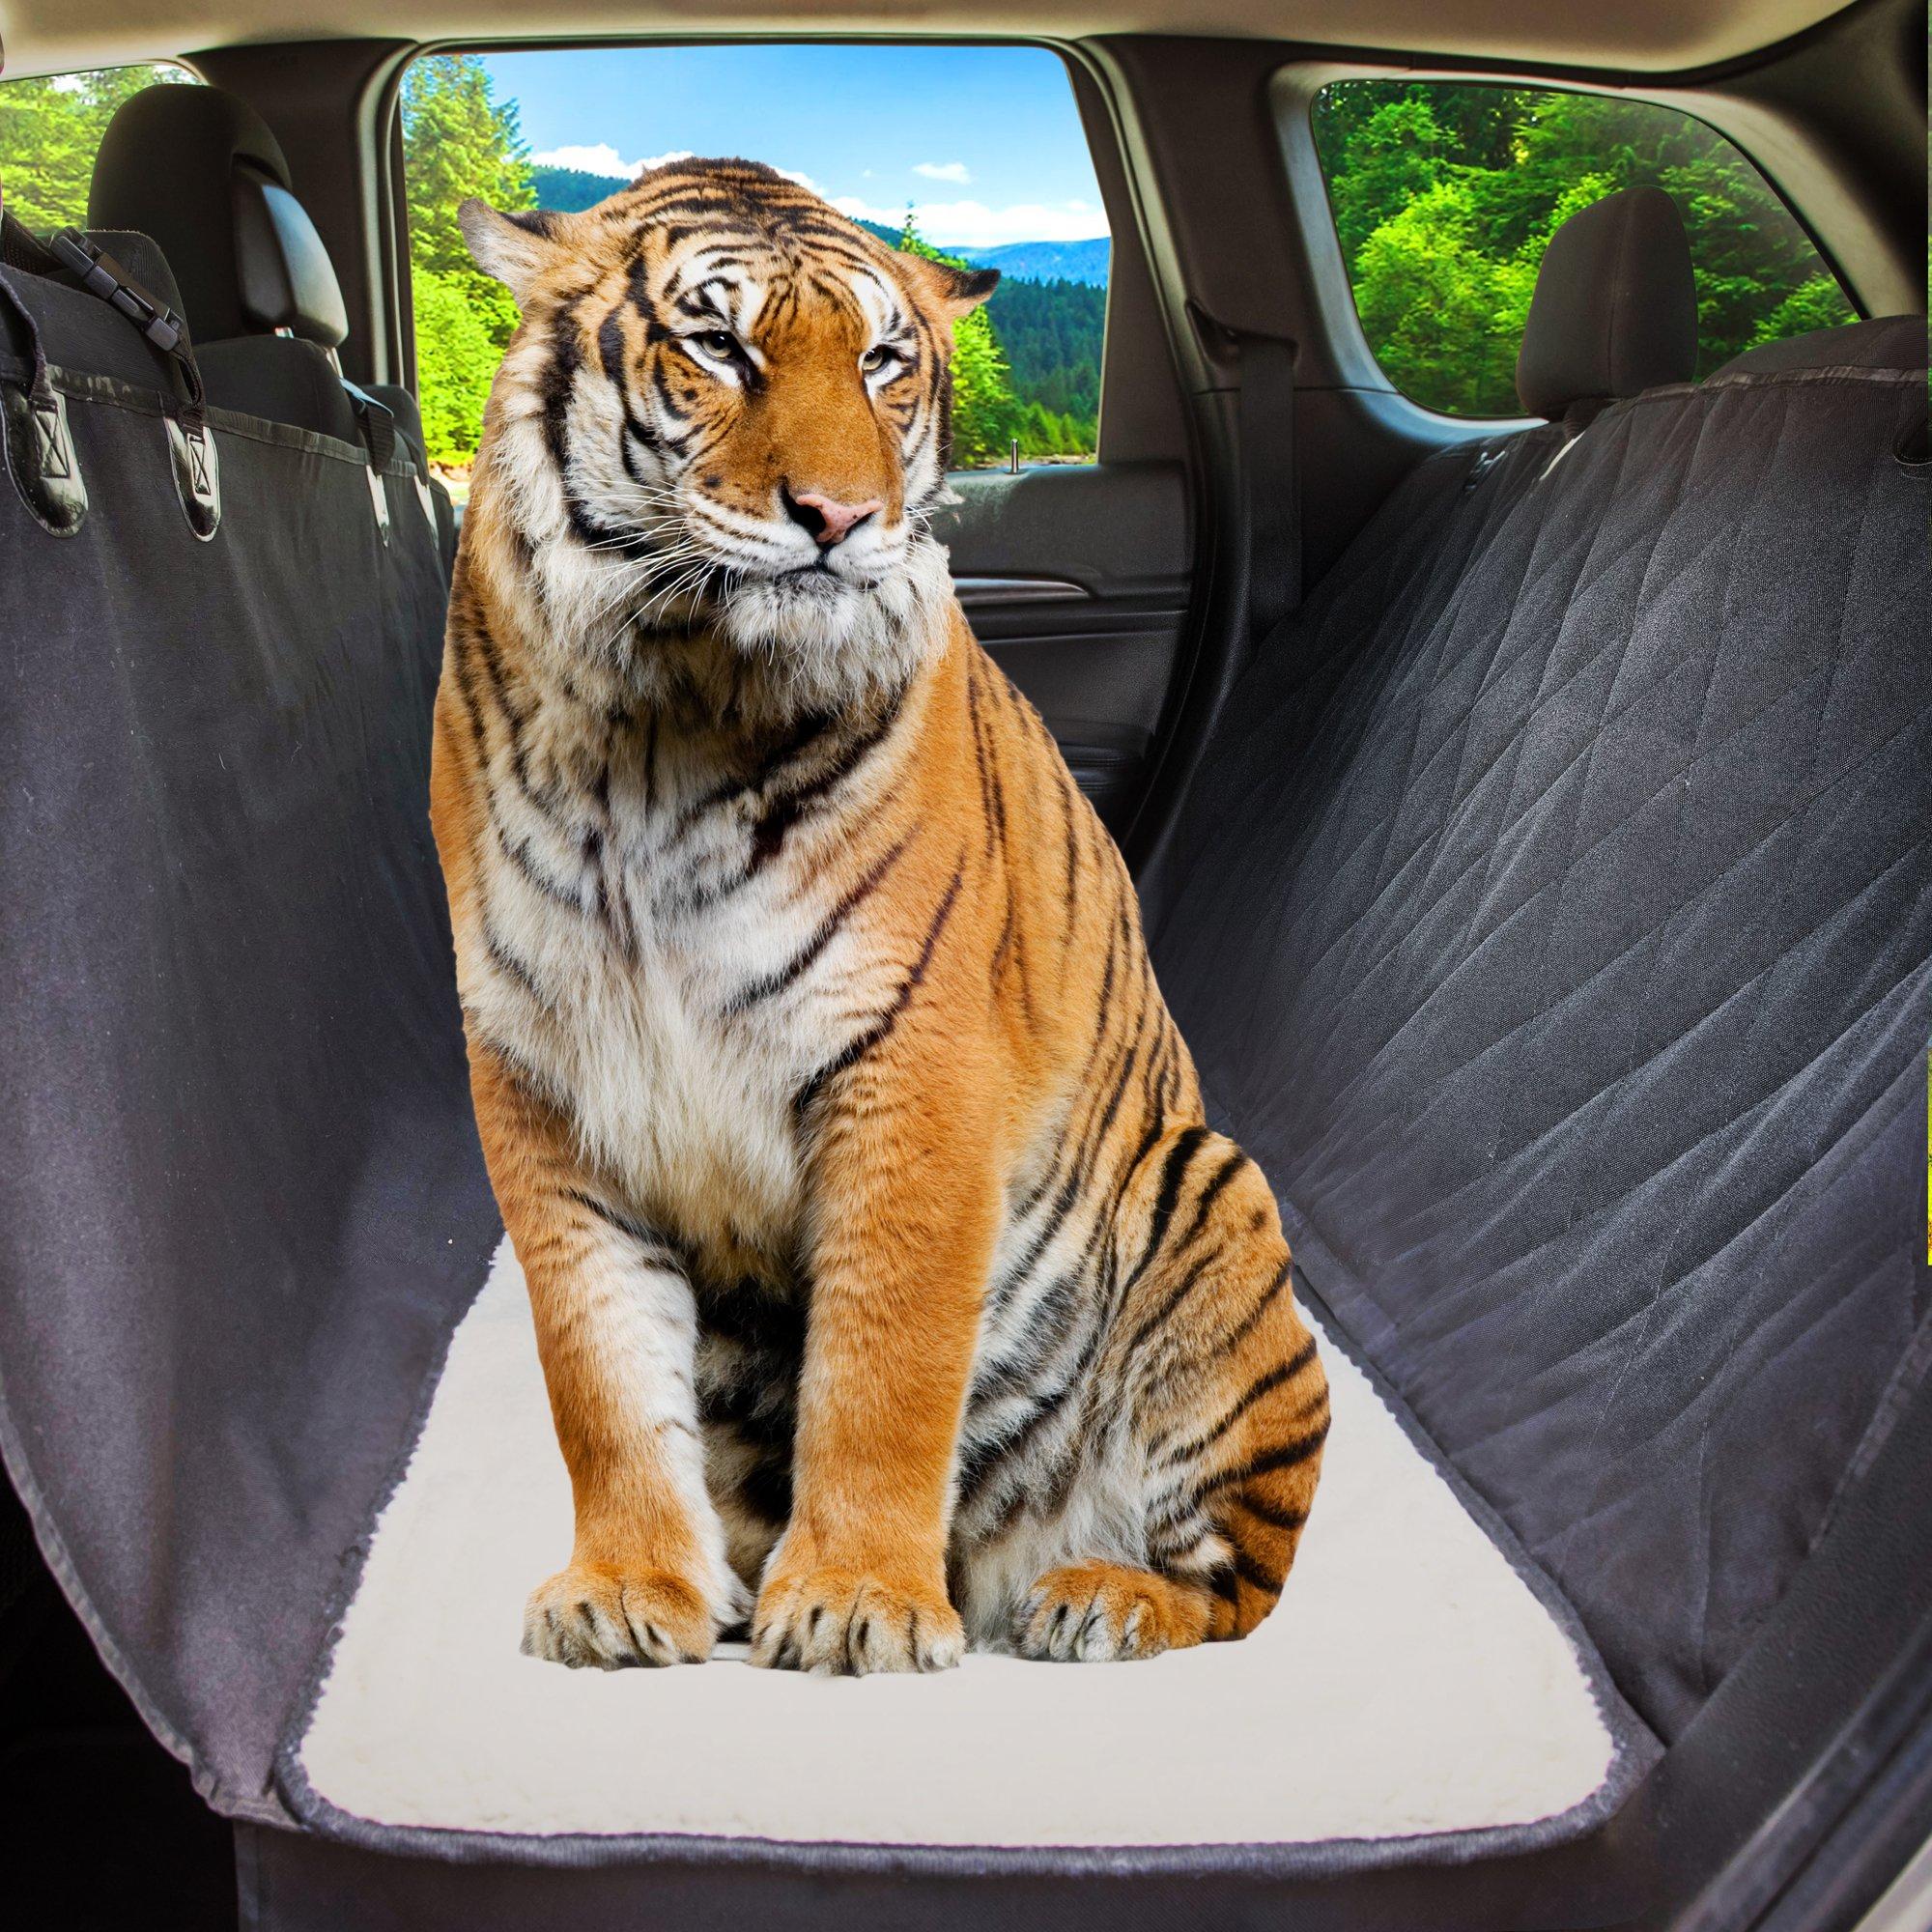 Dog Car Seat Cover Hair Free Rear Bench, Convertible Black Hammock Shaped Comfort Accessory for Cars, SUVs & Trucks. Waterproof, Nonslip, Washable Pet Backseat Protector, Pets Blanket & Bag